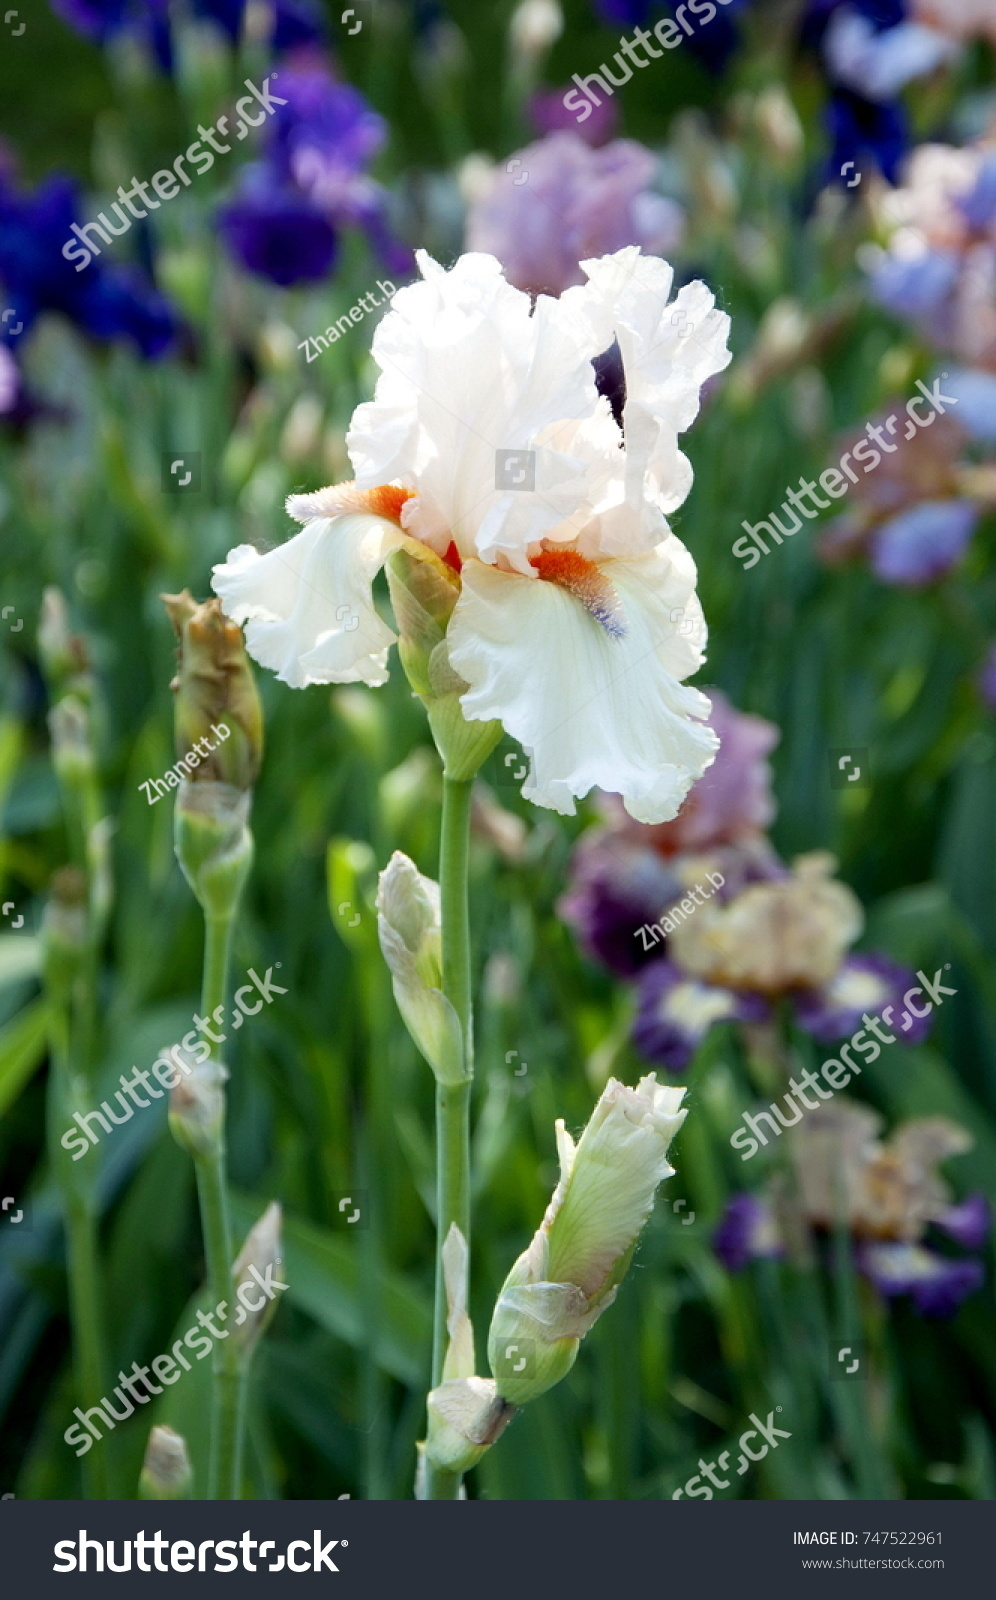 Beautiful white iris blooms may stock photo 747522961 shutterstock beautiful white iris blooms in may izmirmasajfo